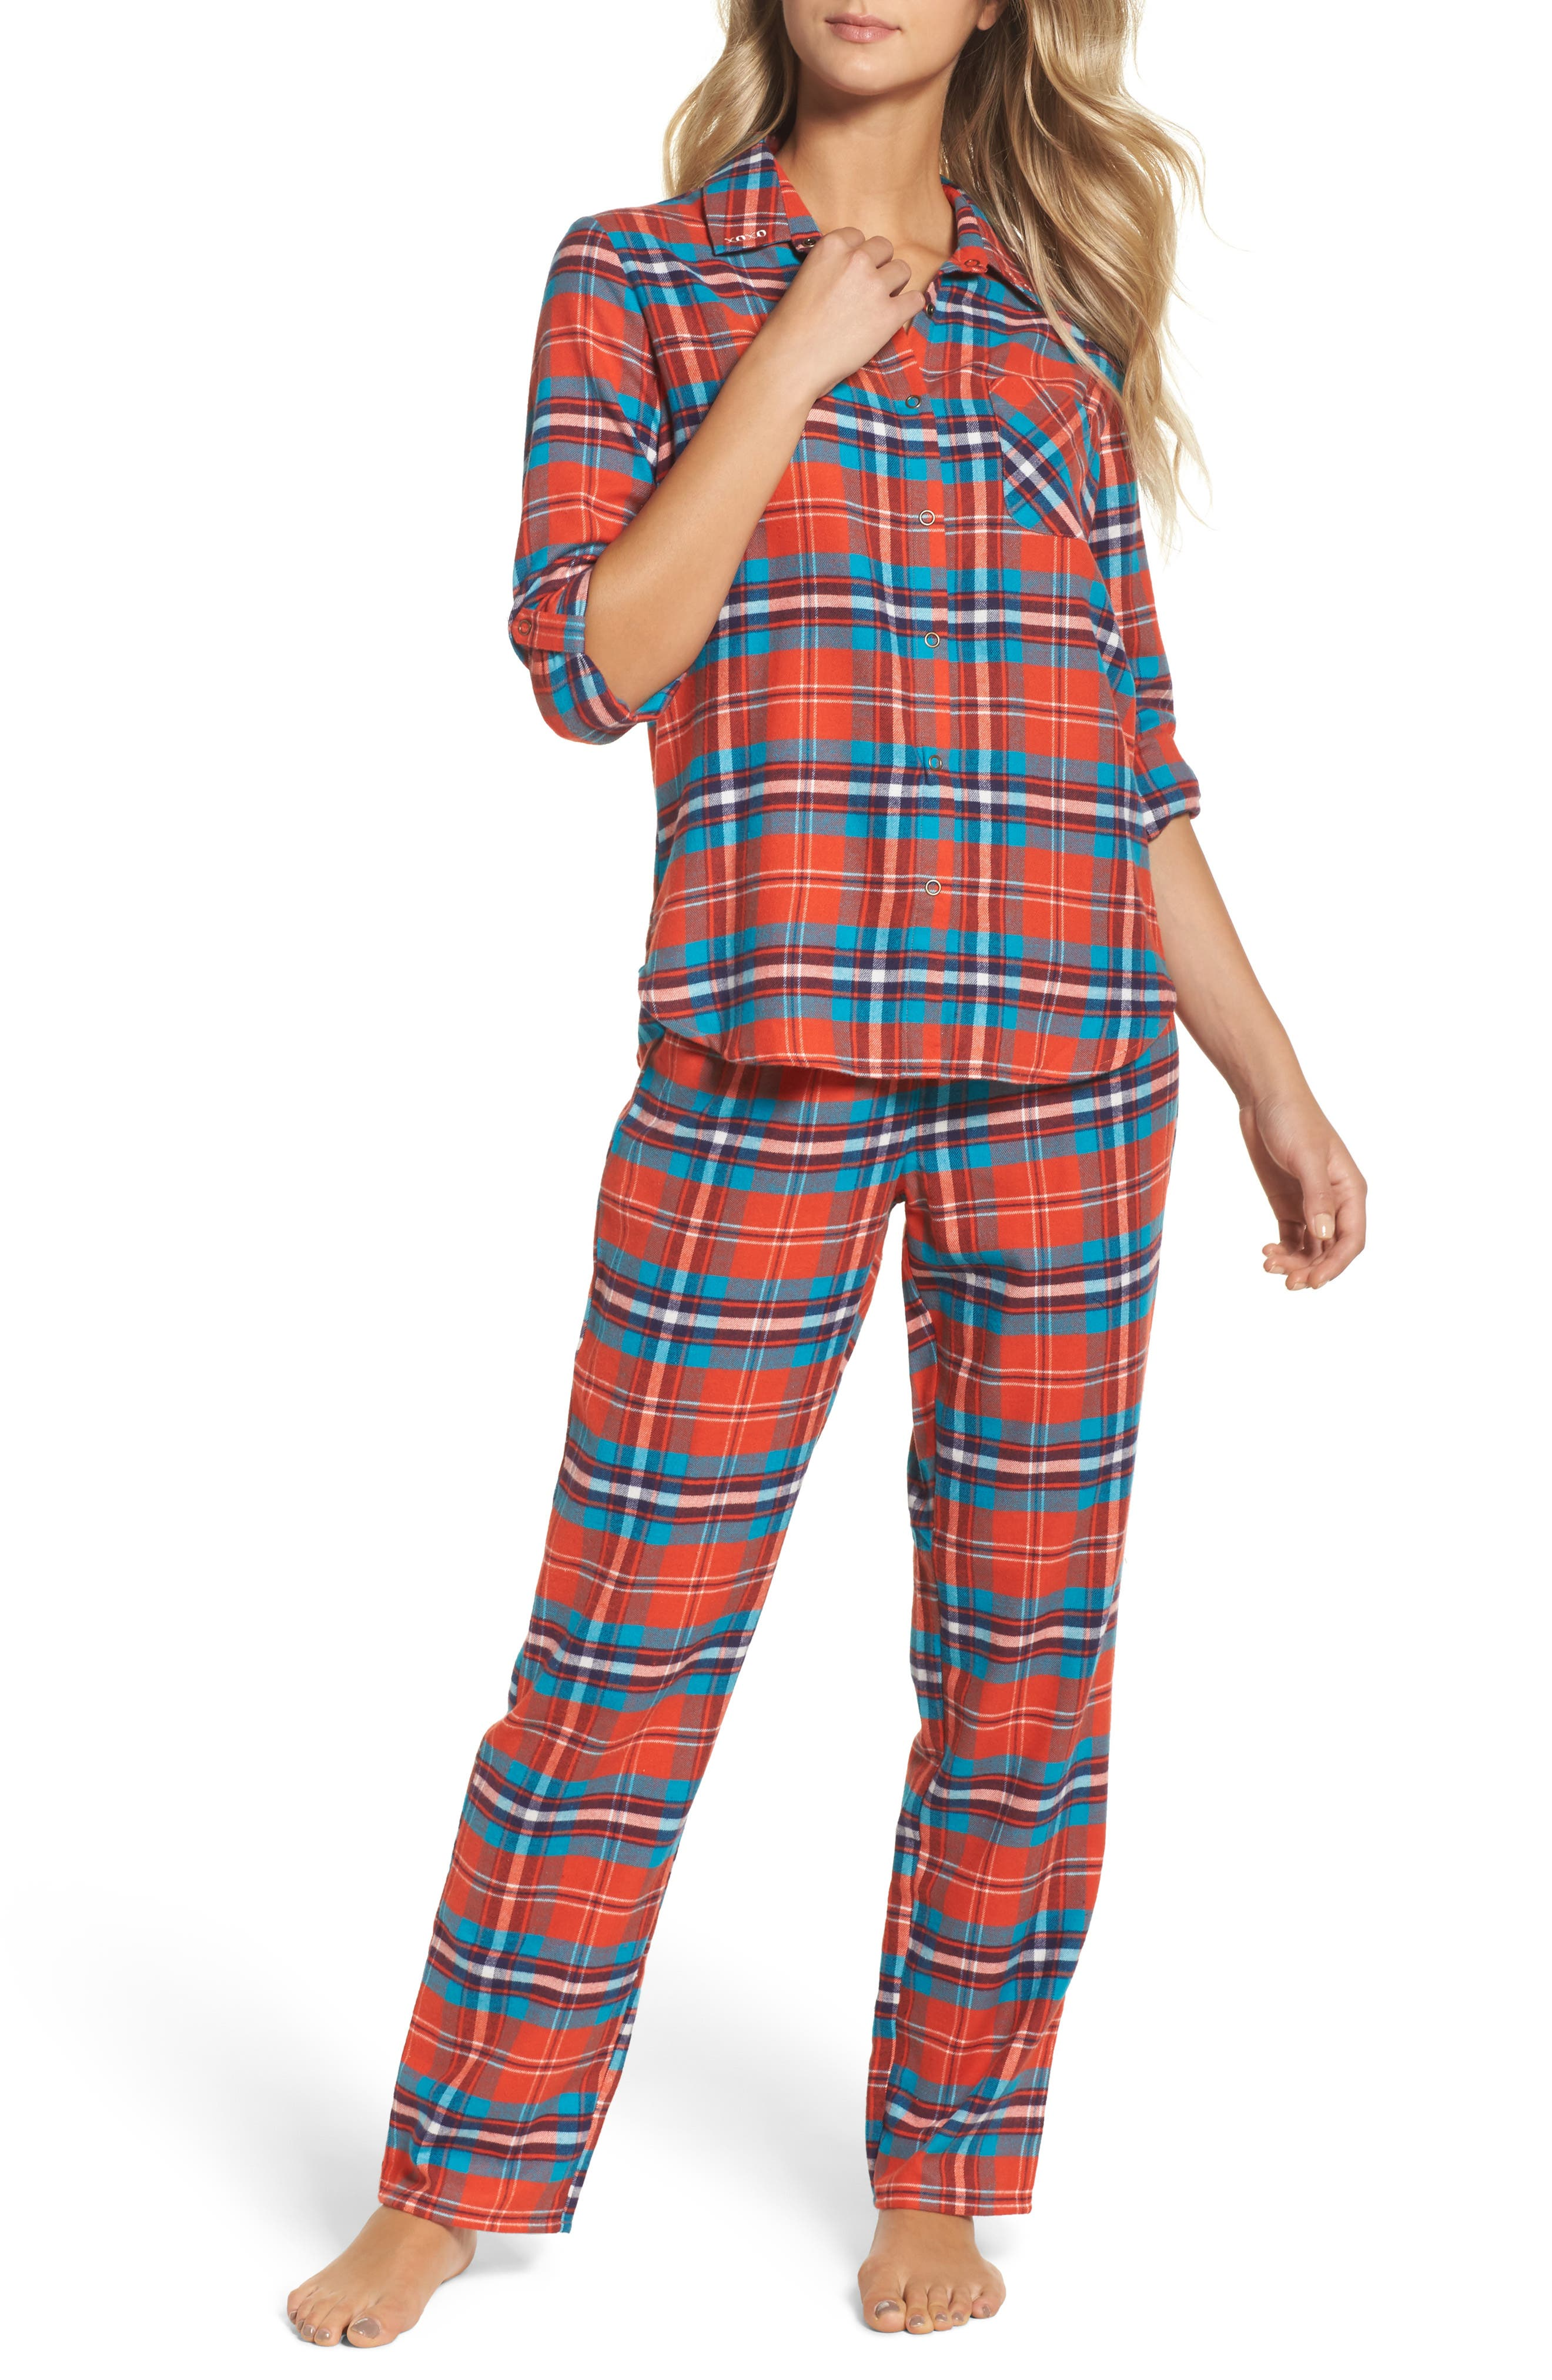 Flannel Girlfriend Pajamas,                         Main,                         color, Red Grenadine Maclean Tartan